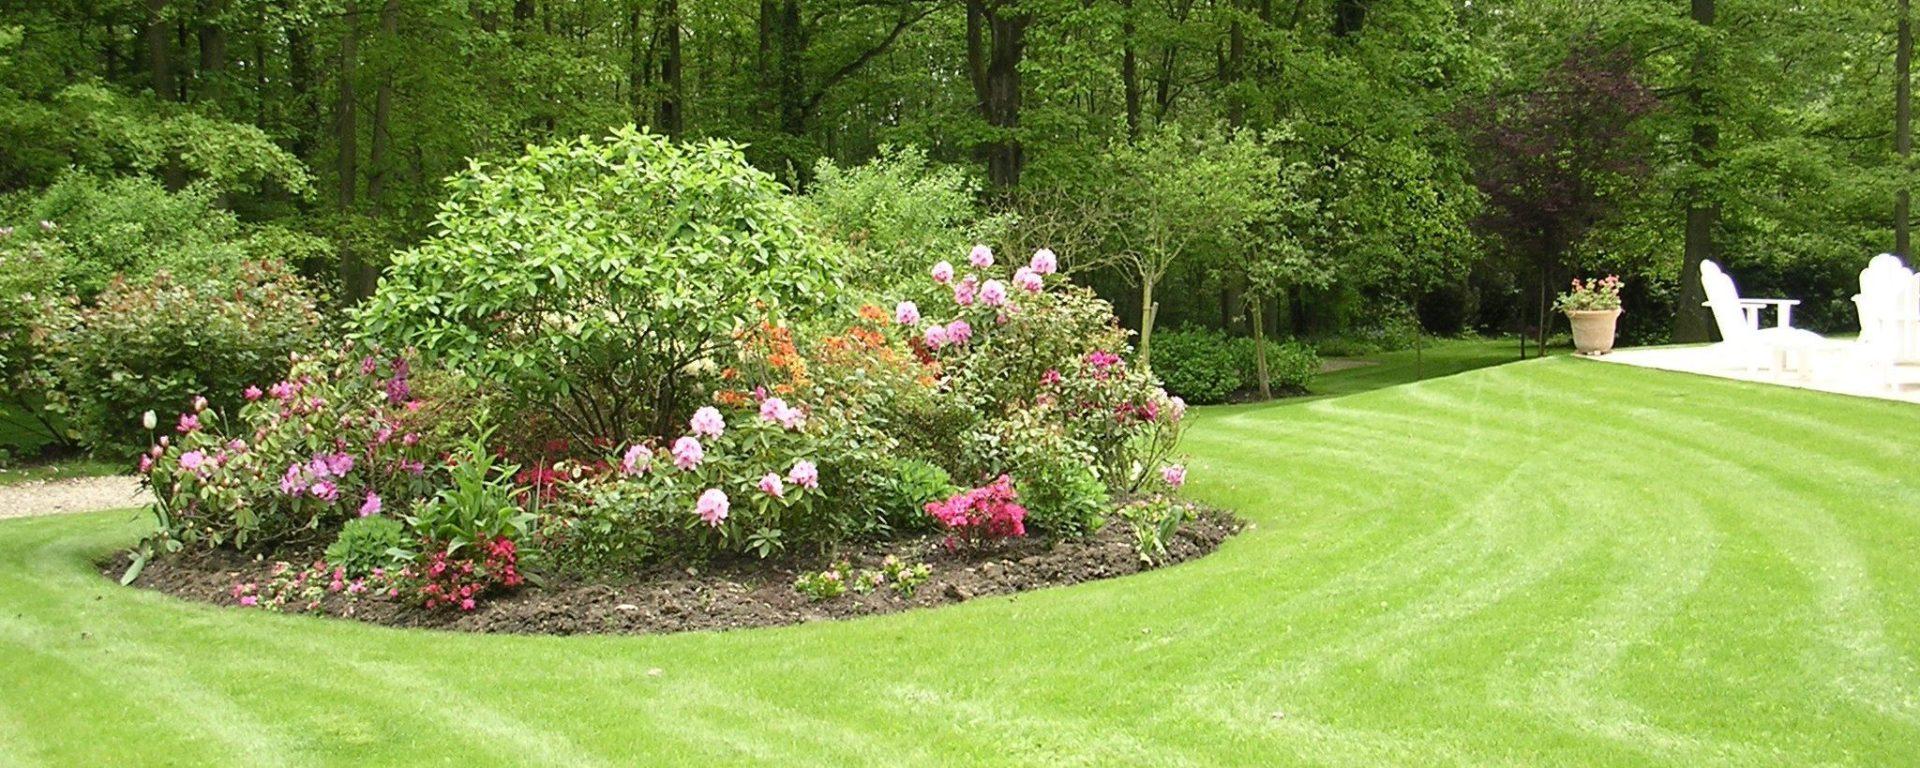 Entretien De Jardin Yvelines 78 Onyx Espaces Verts